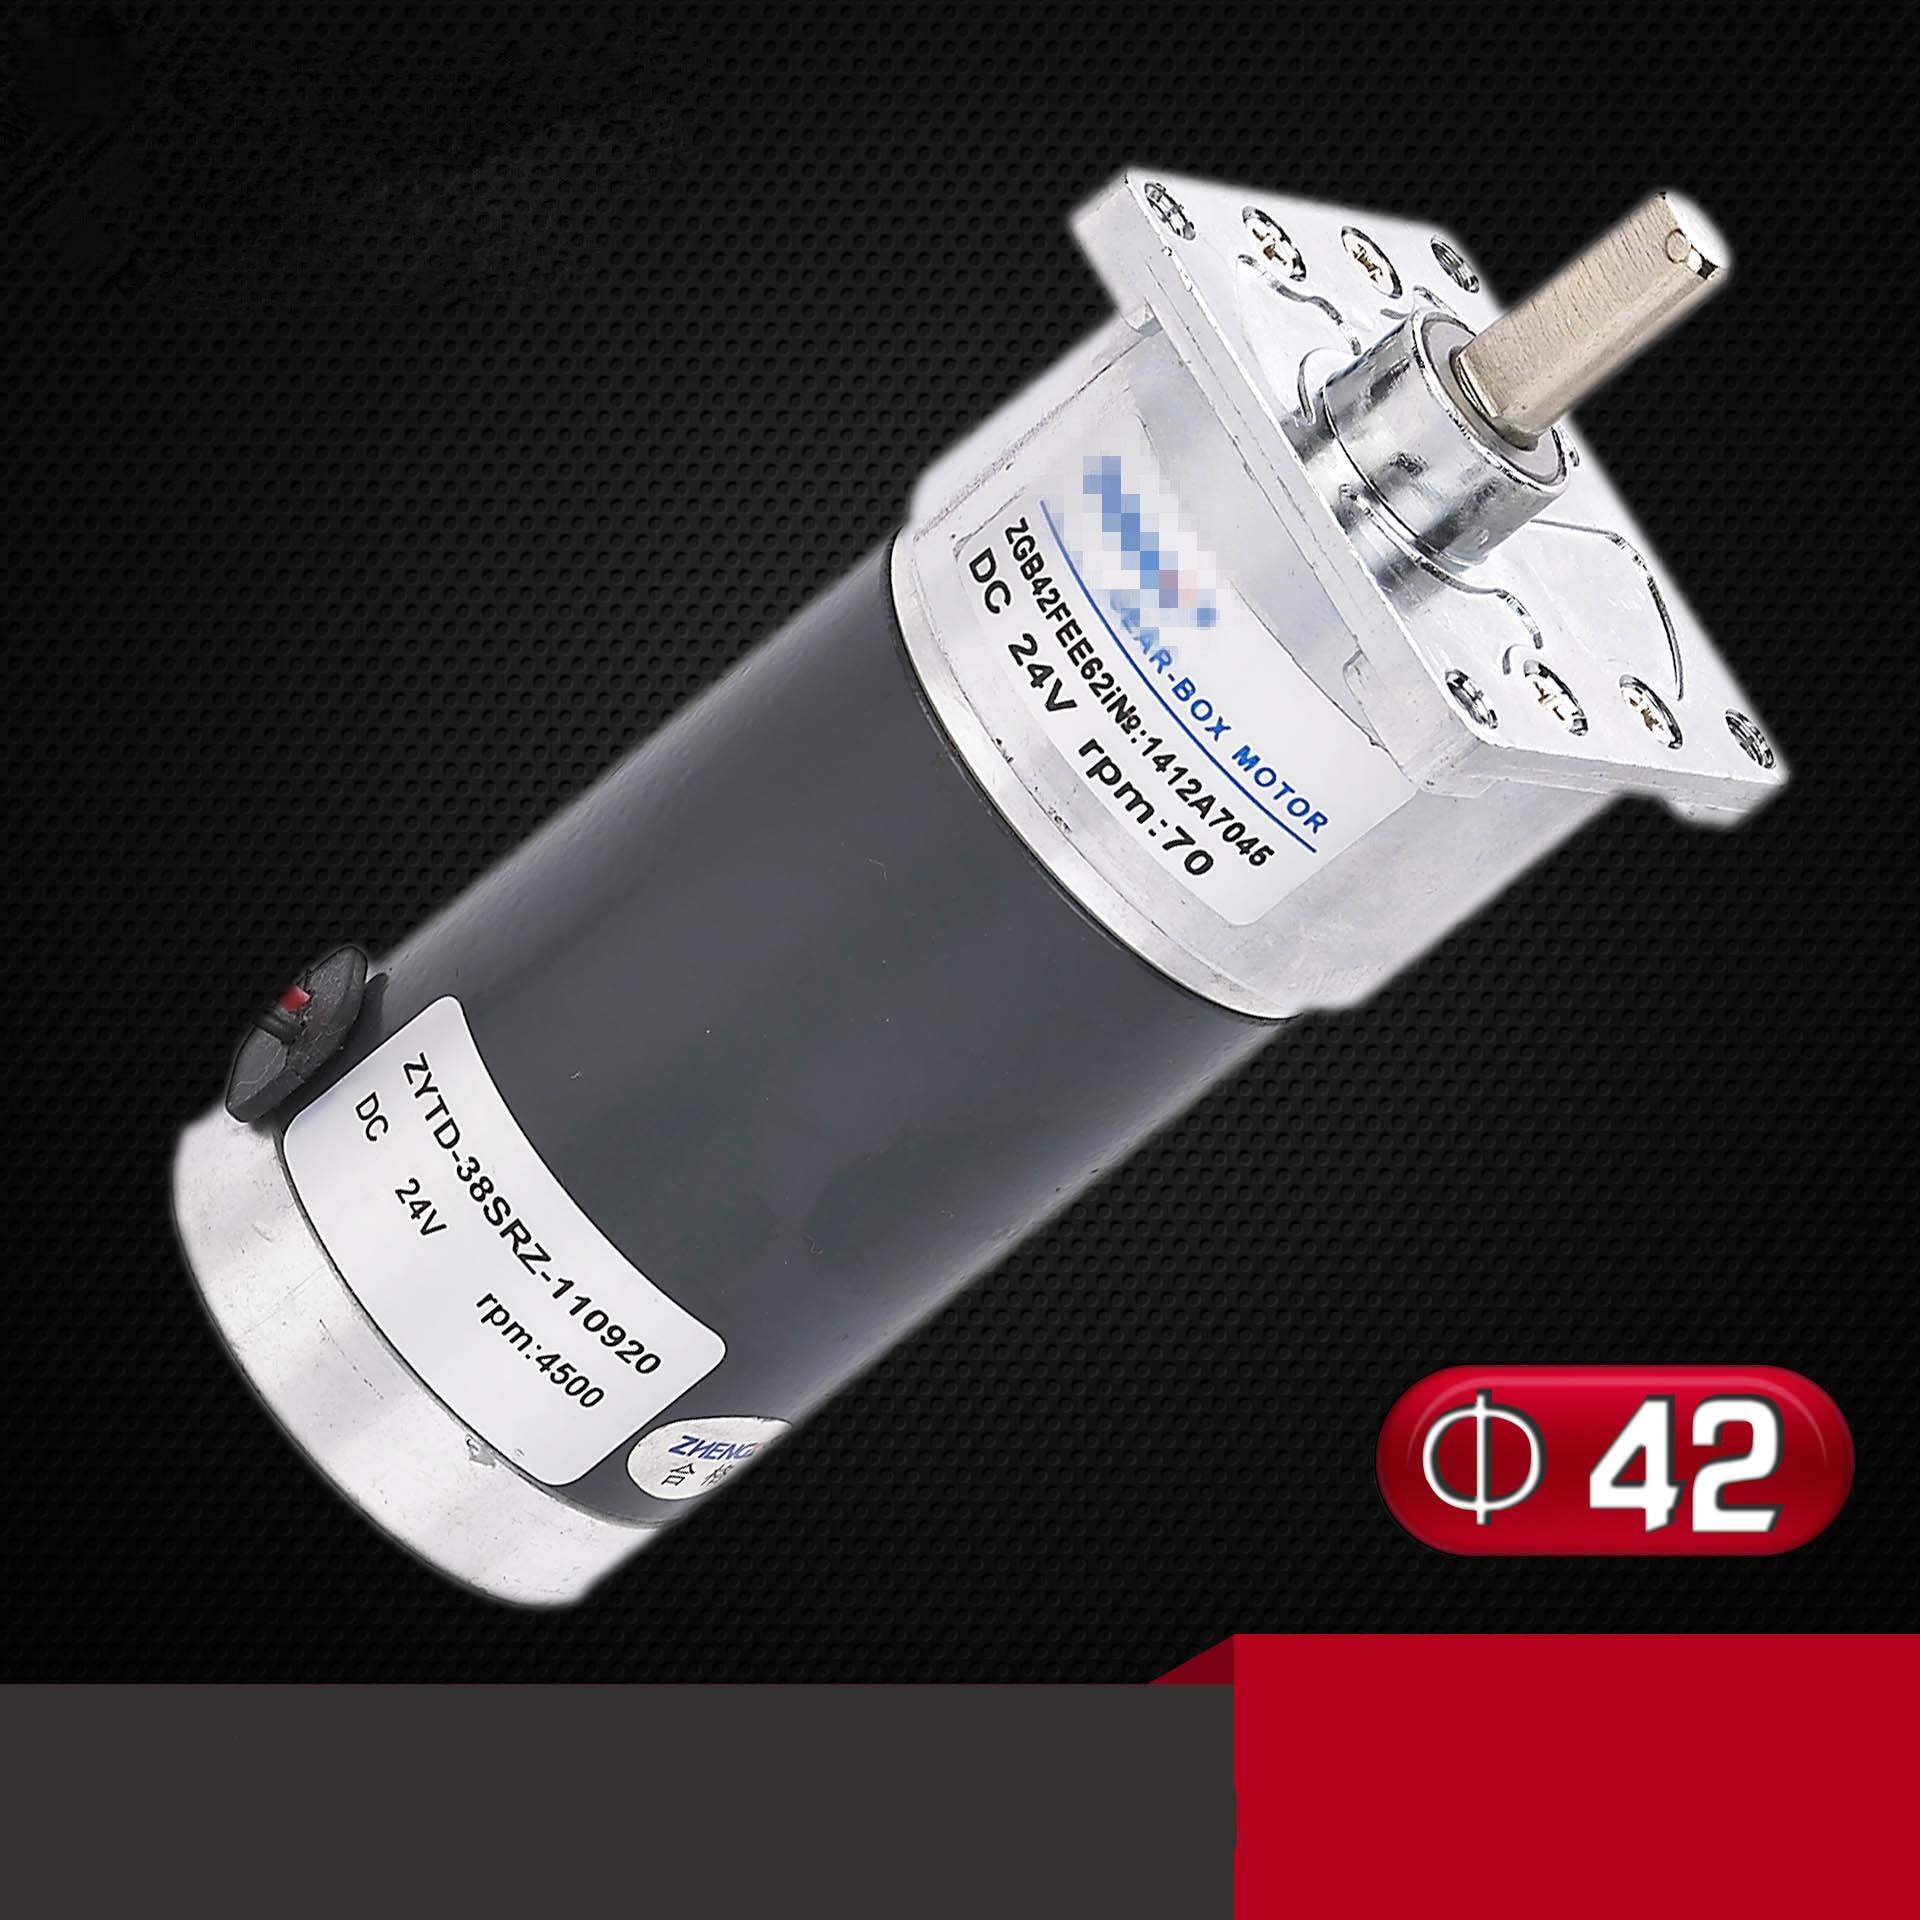 ZGB42FEE Reducer 12V 24V DC Permanent Magnet Motor Reversing 10RPM-500RPM 7mm Shaft 42mm DIA ручной инструмент die 14 5 7mm 20 dia